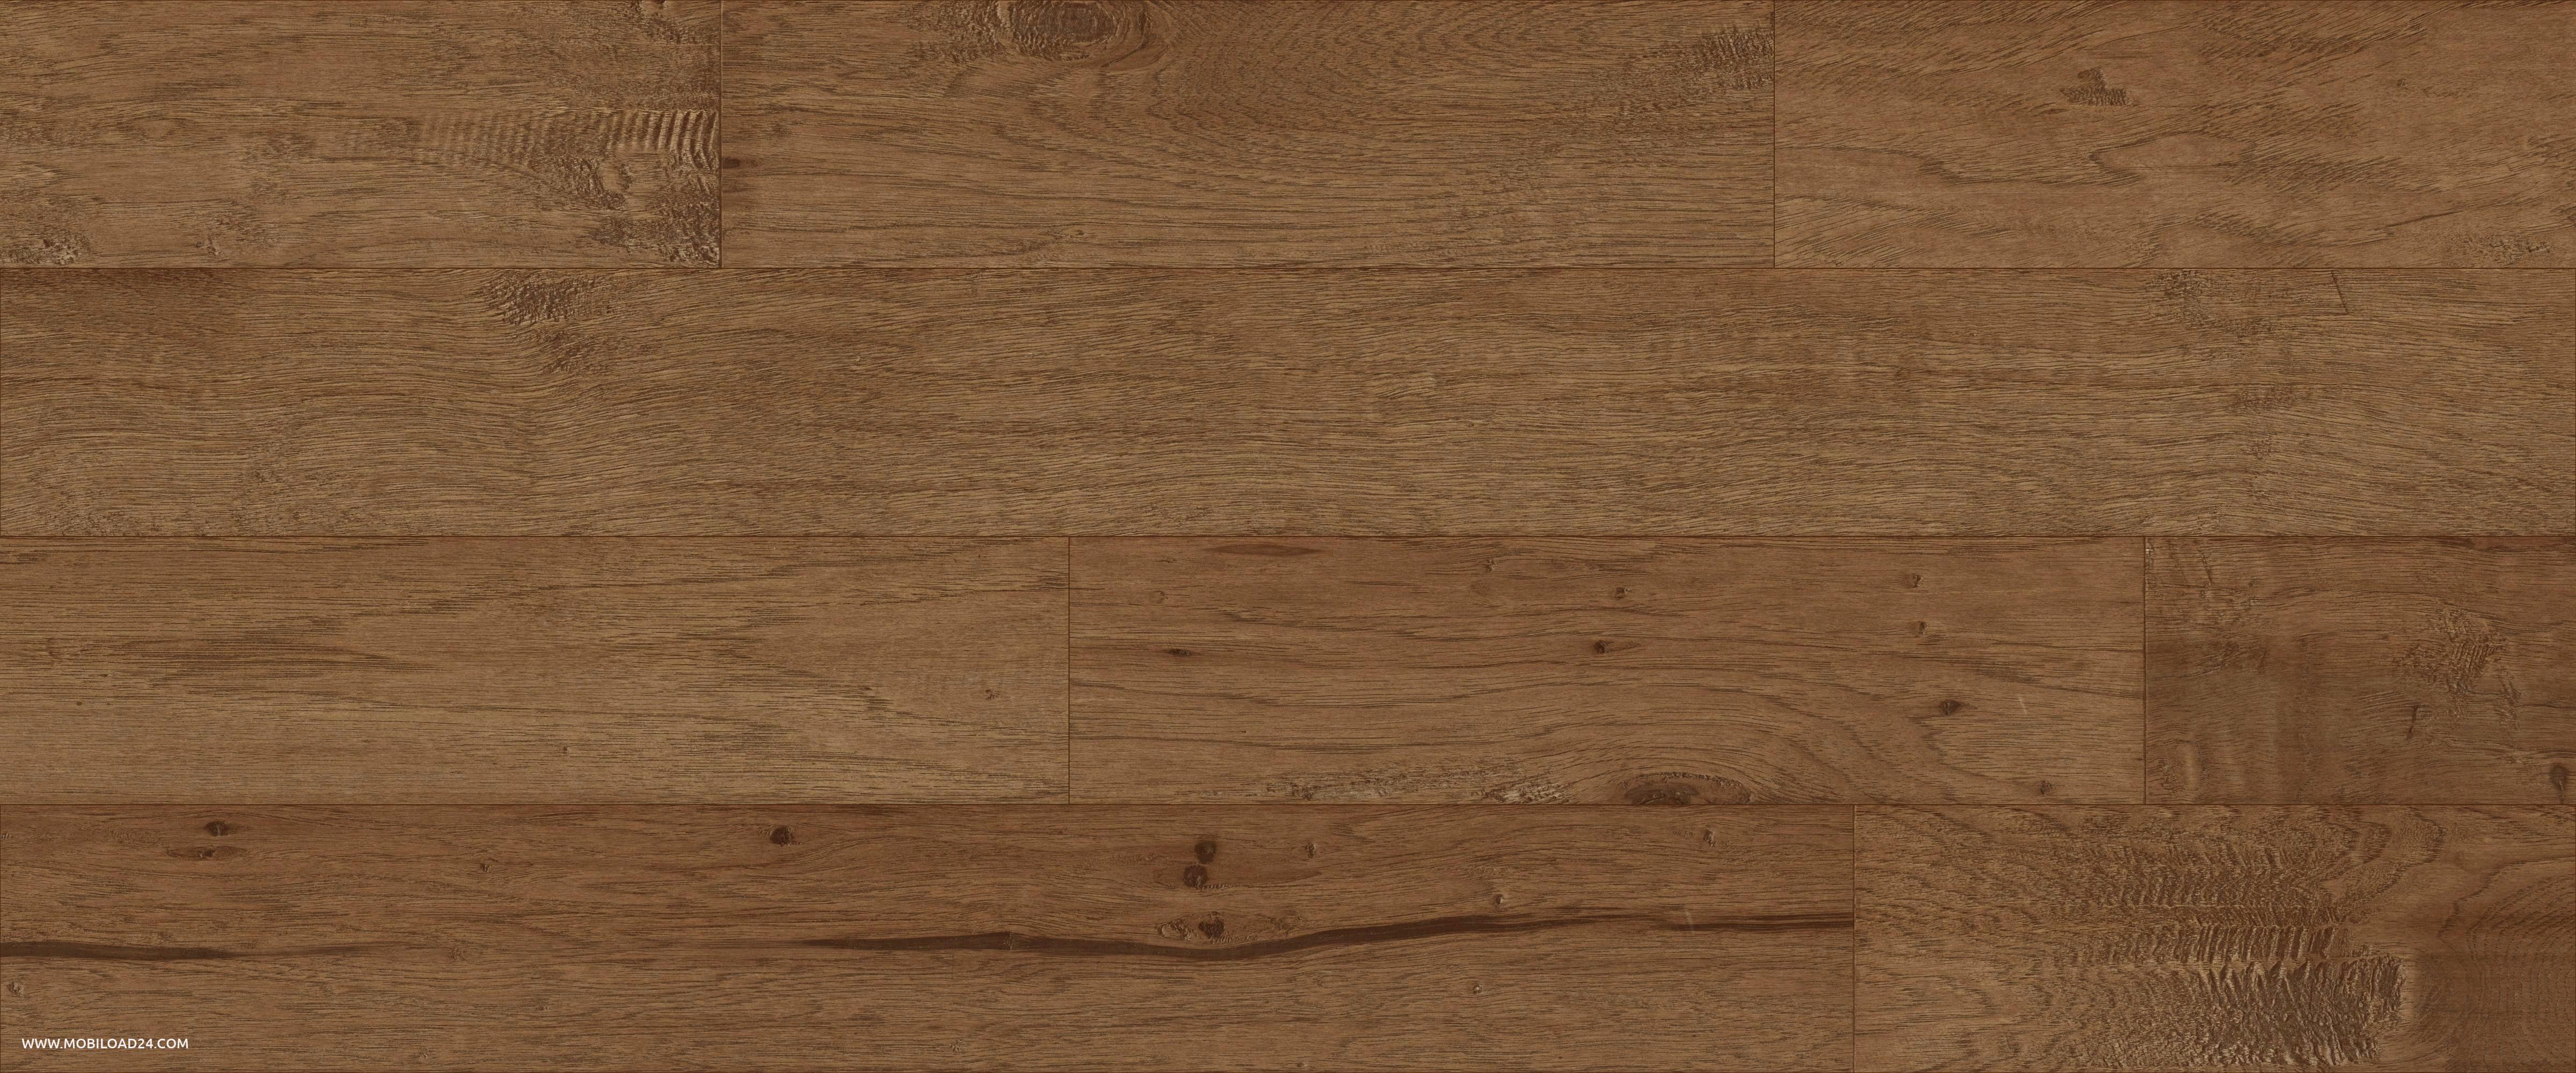 home depot hardwood floor installation reviews of home depot flooring estimator elegant home depot wood flooring fresh intended for 26 luxury gallery of home depot flooring estimator home depot flooring estimator new decor hardwood floor